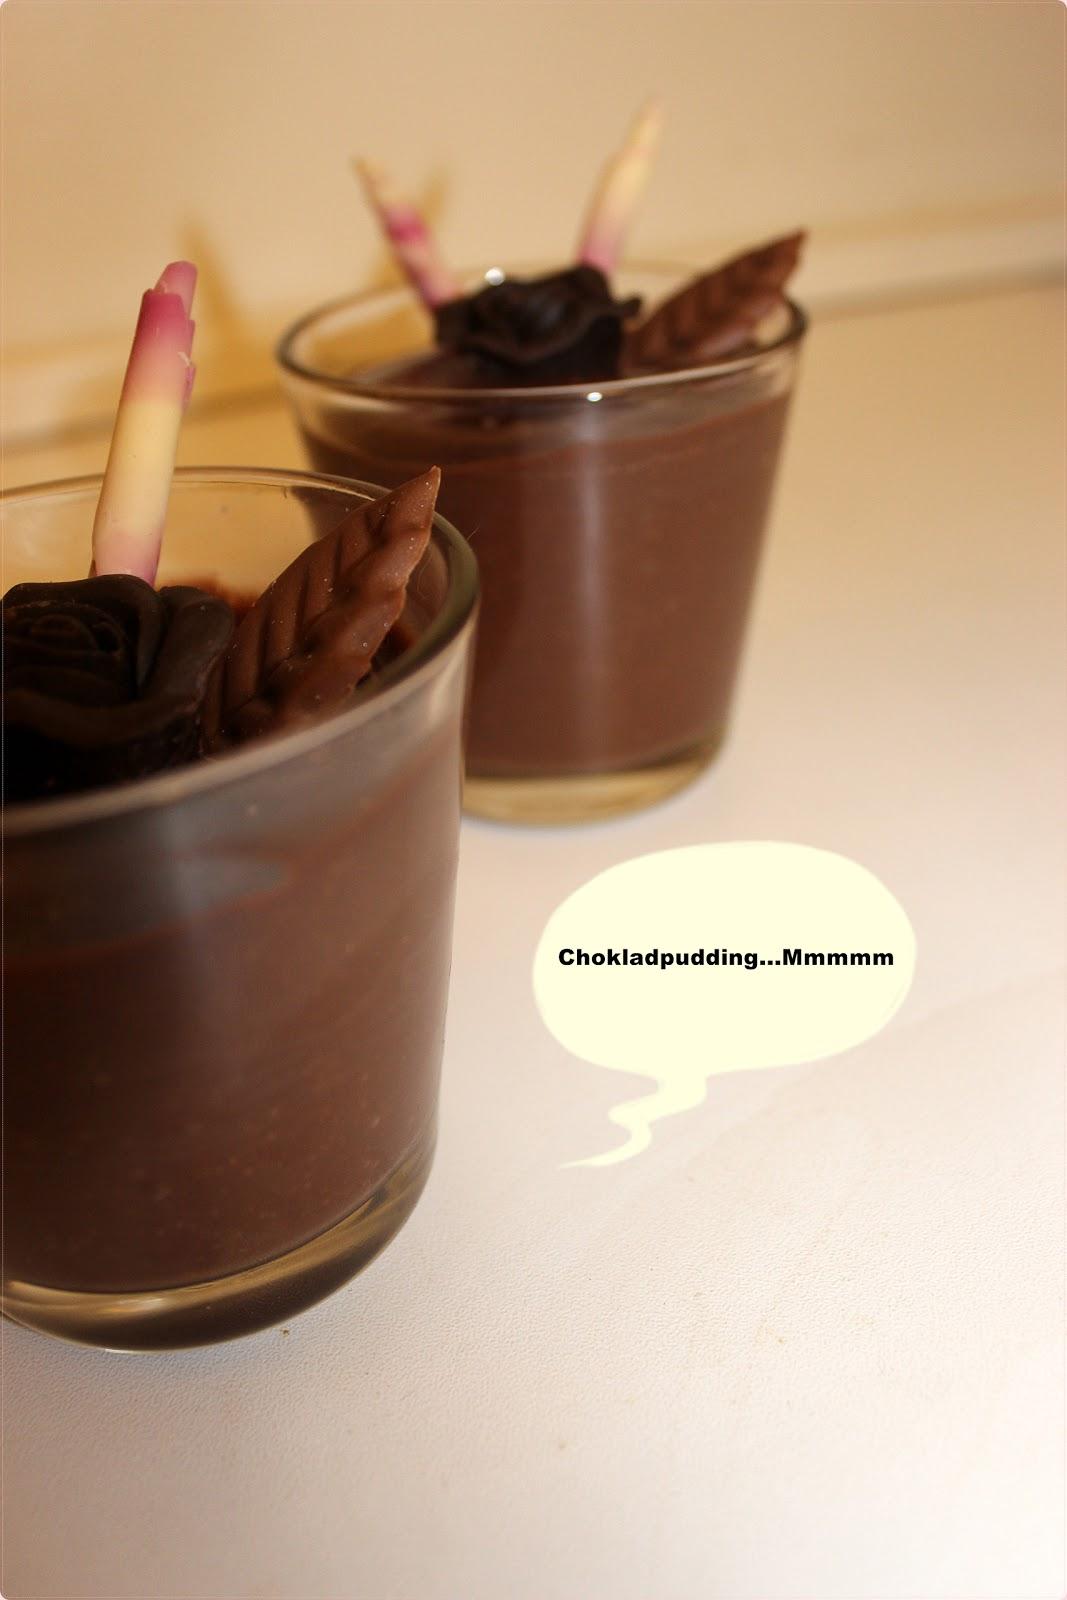 hur gör man chokladpudding